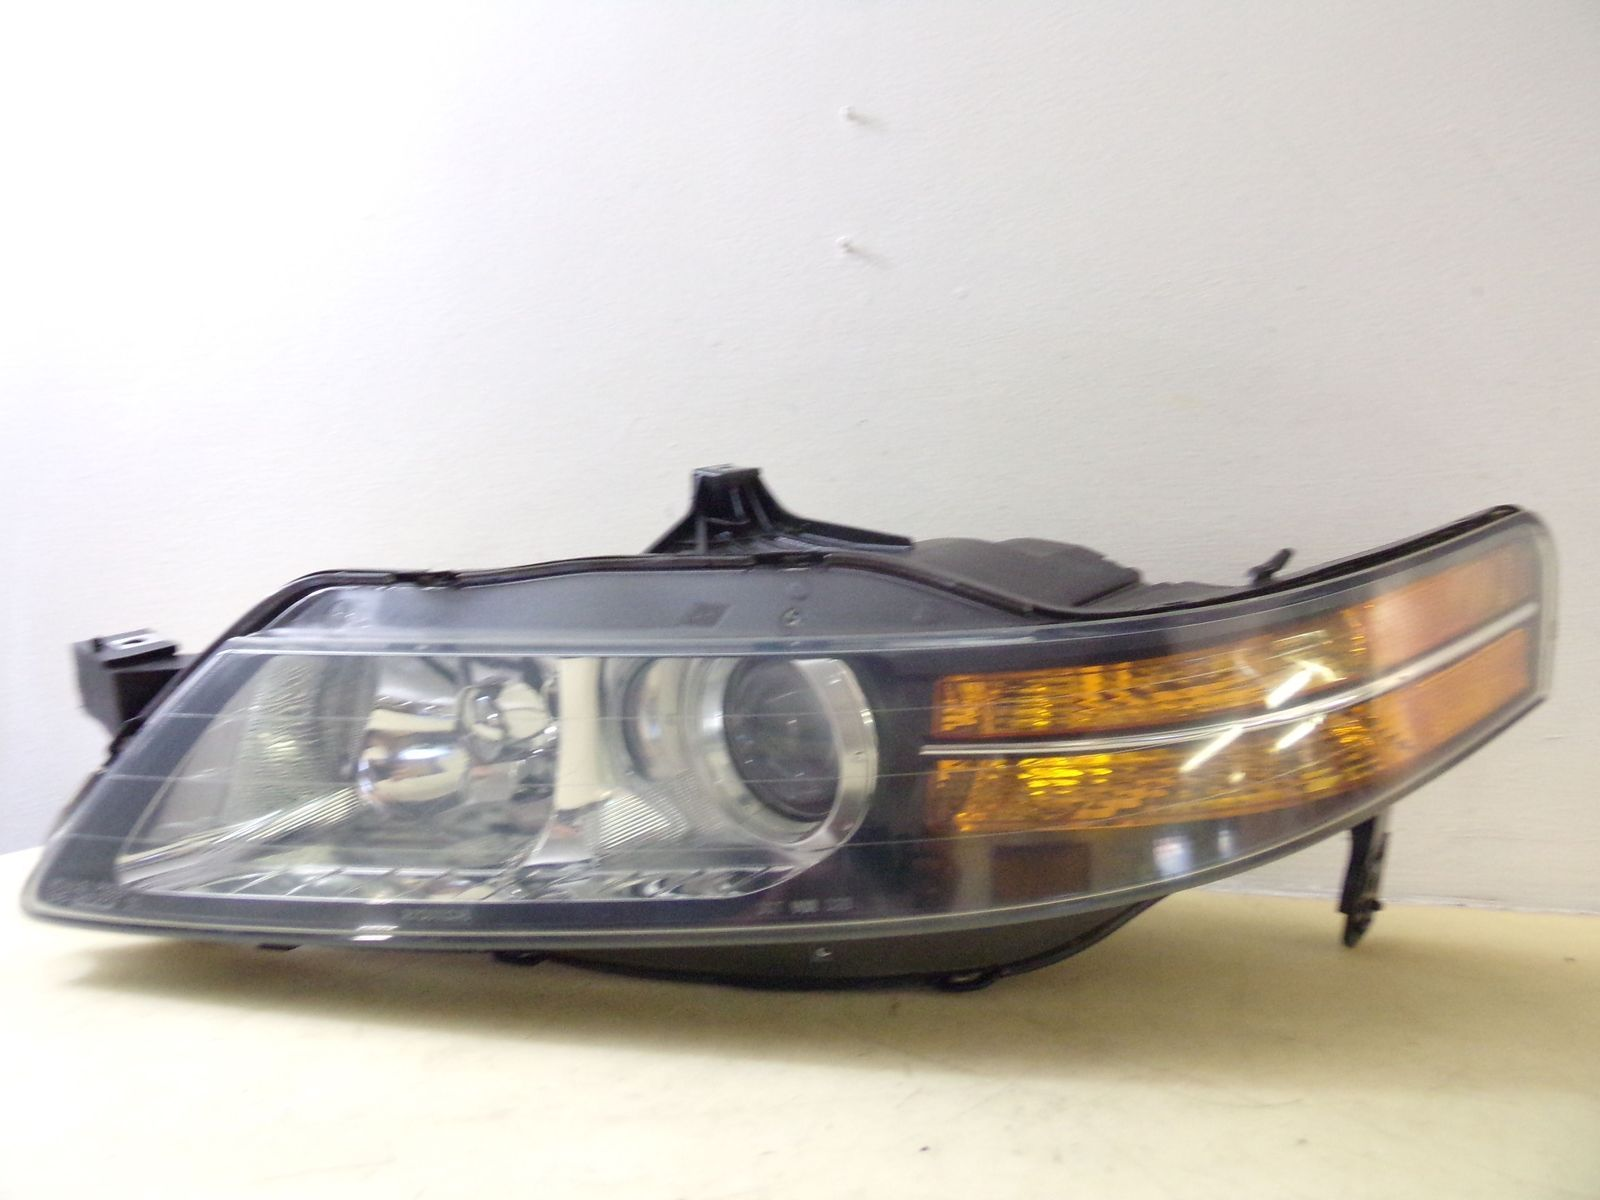 Acura Tl Driver Lh Xenon Hid And Similar Items - 2004 acura tl headlight